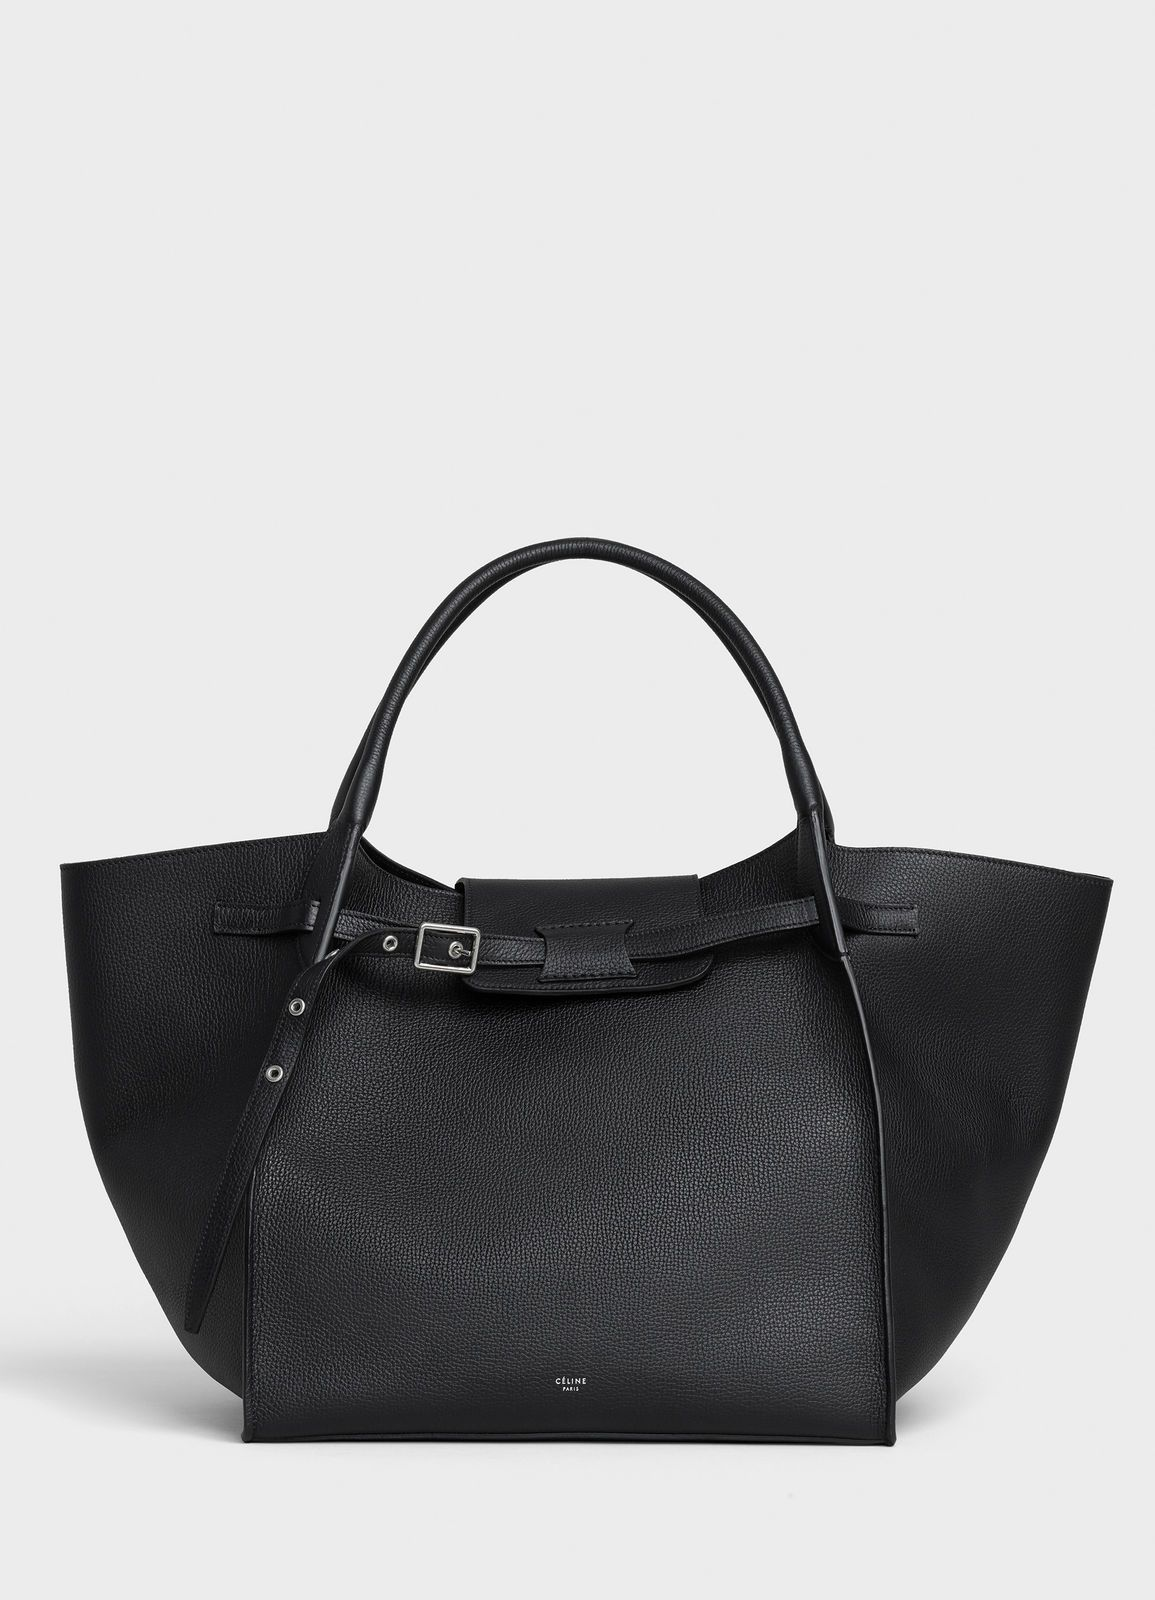 6d09f16c96 Medium Big bag in supple grained calfskin - Black - Official website ...